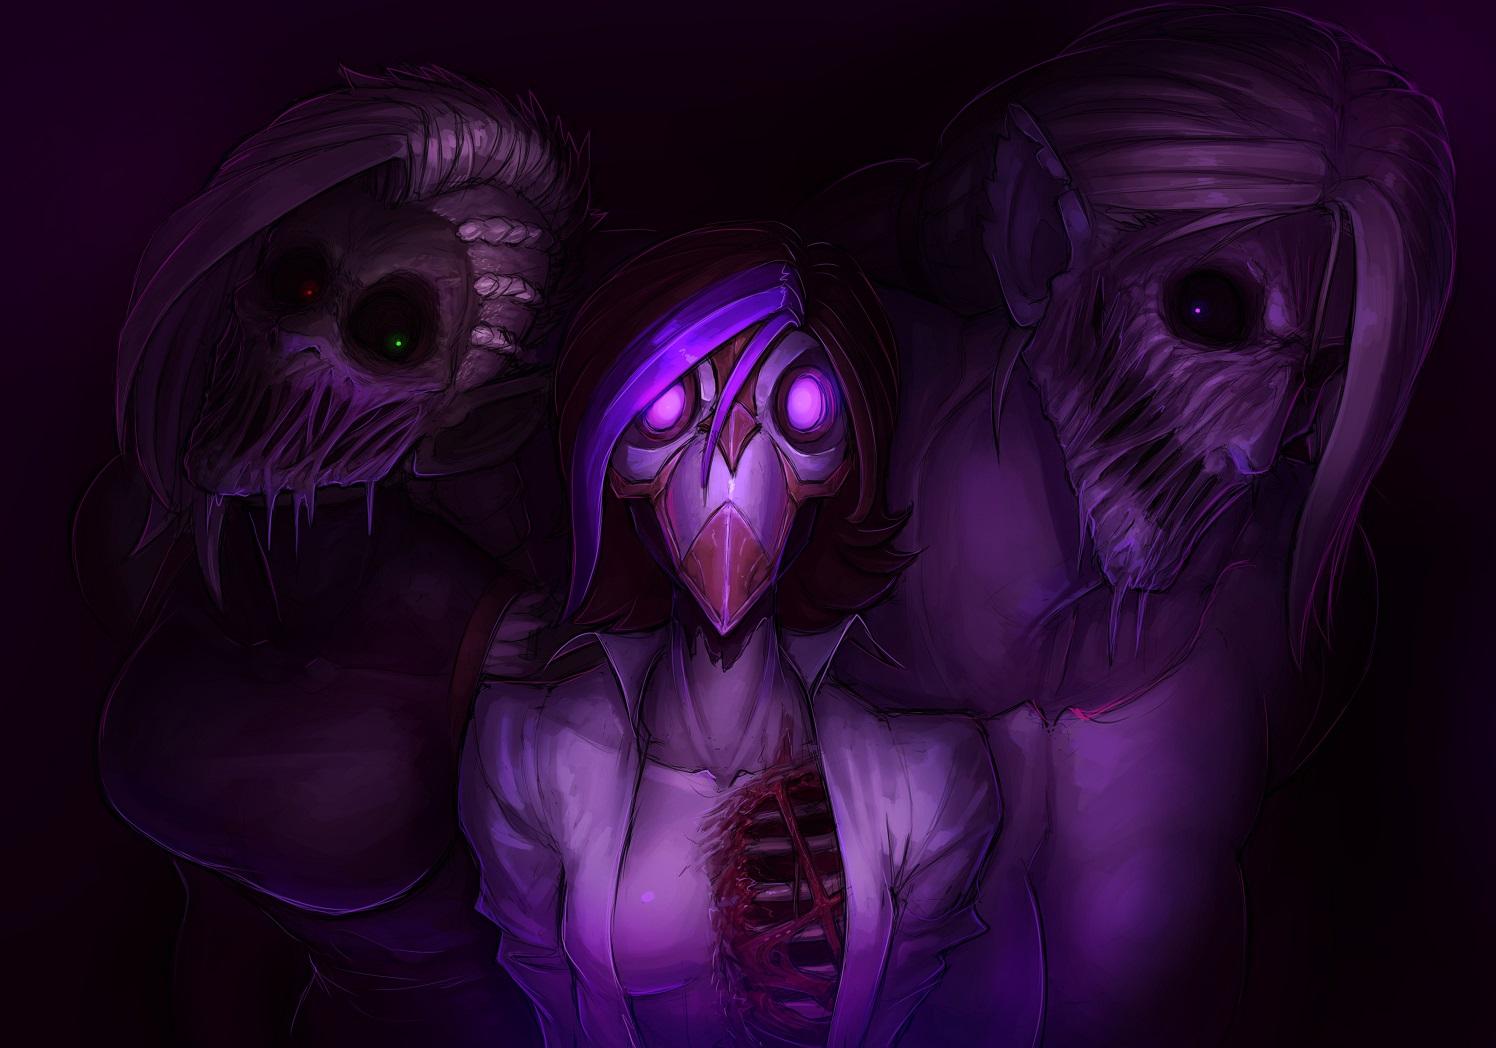 Eva's Nightmare